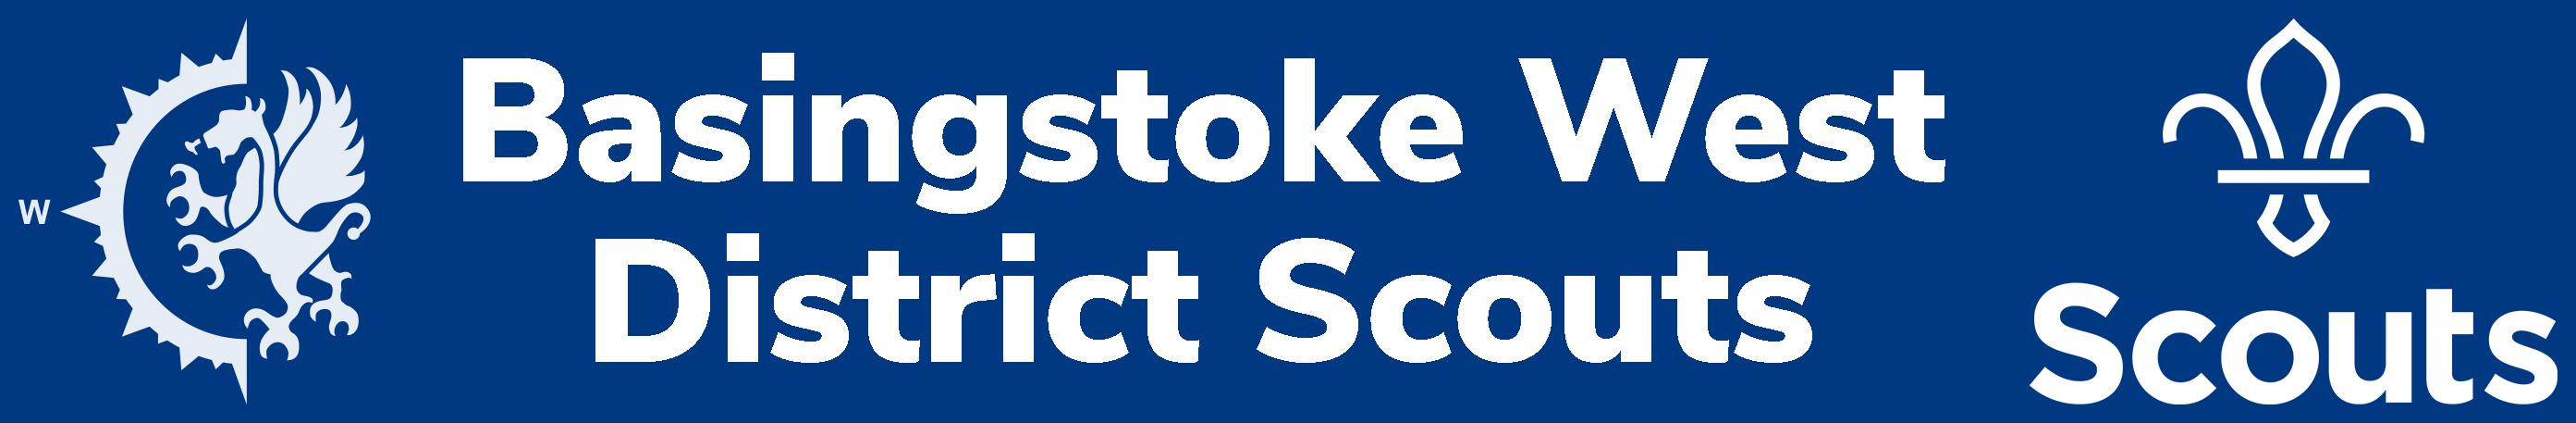 Basingstoke West District Scouts